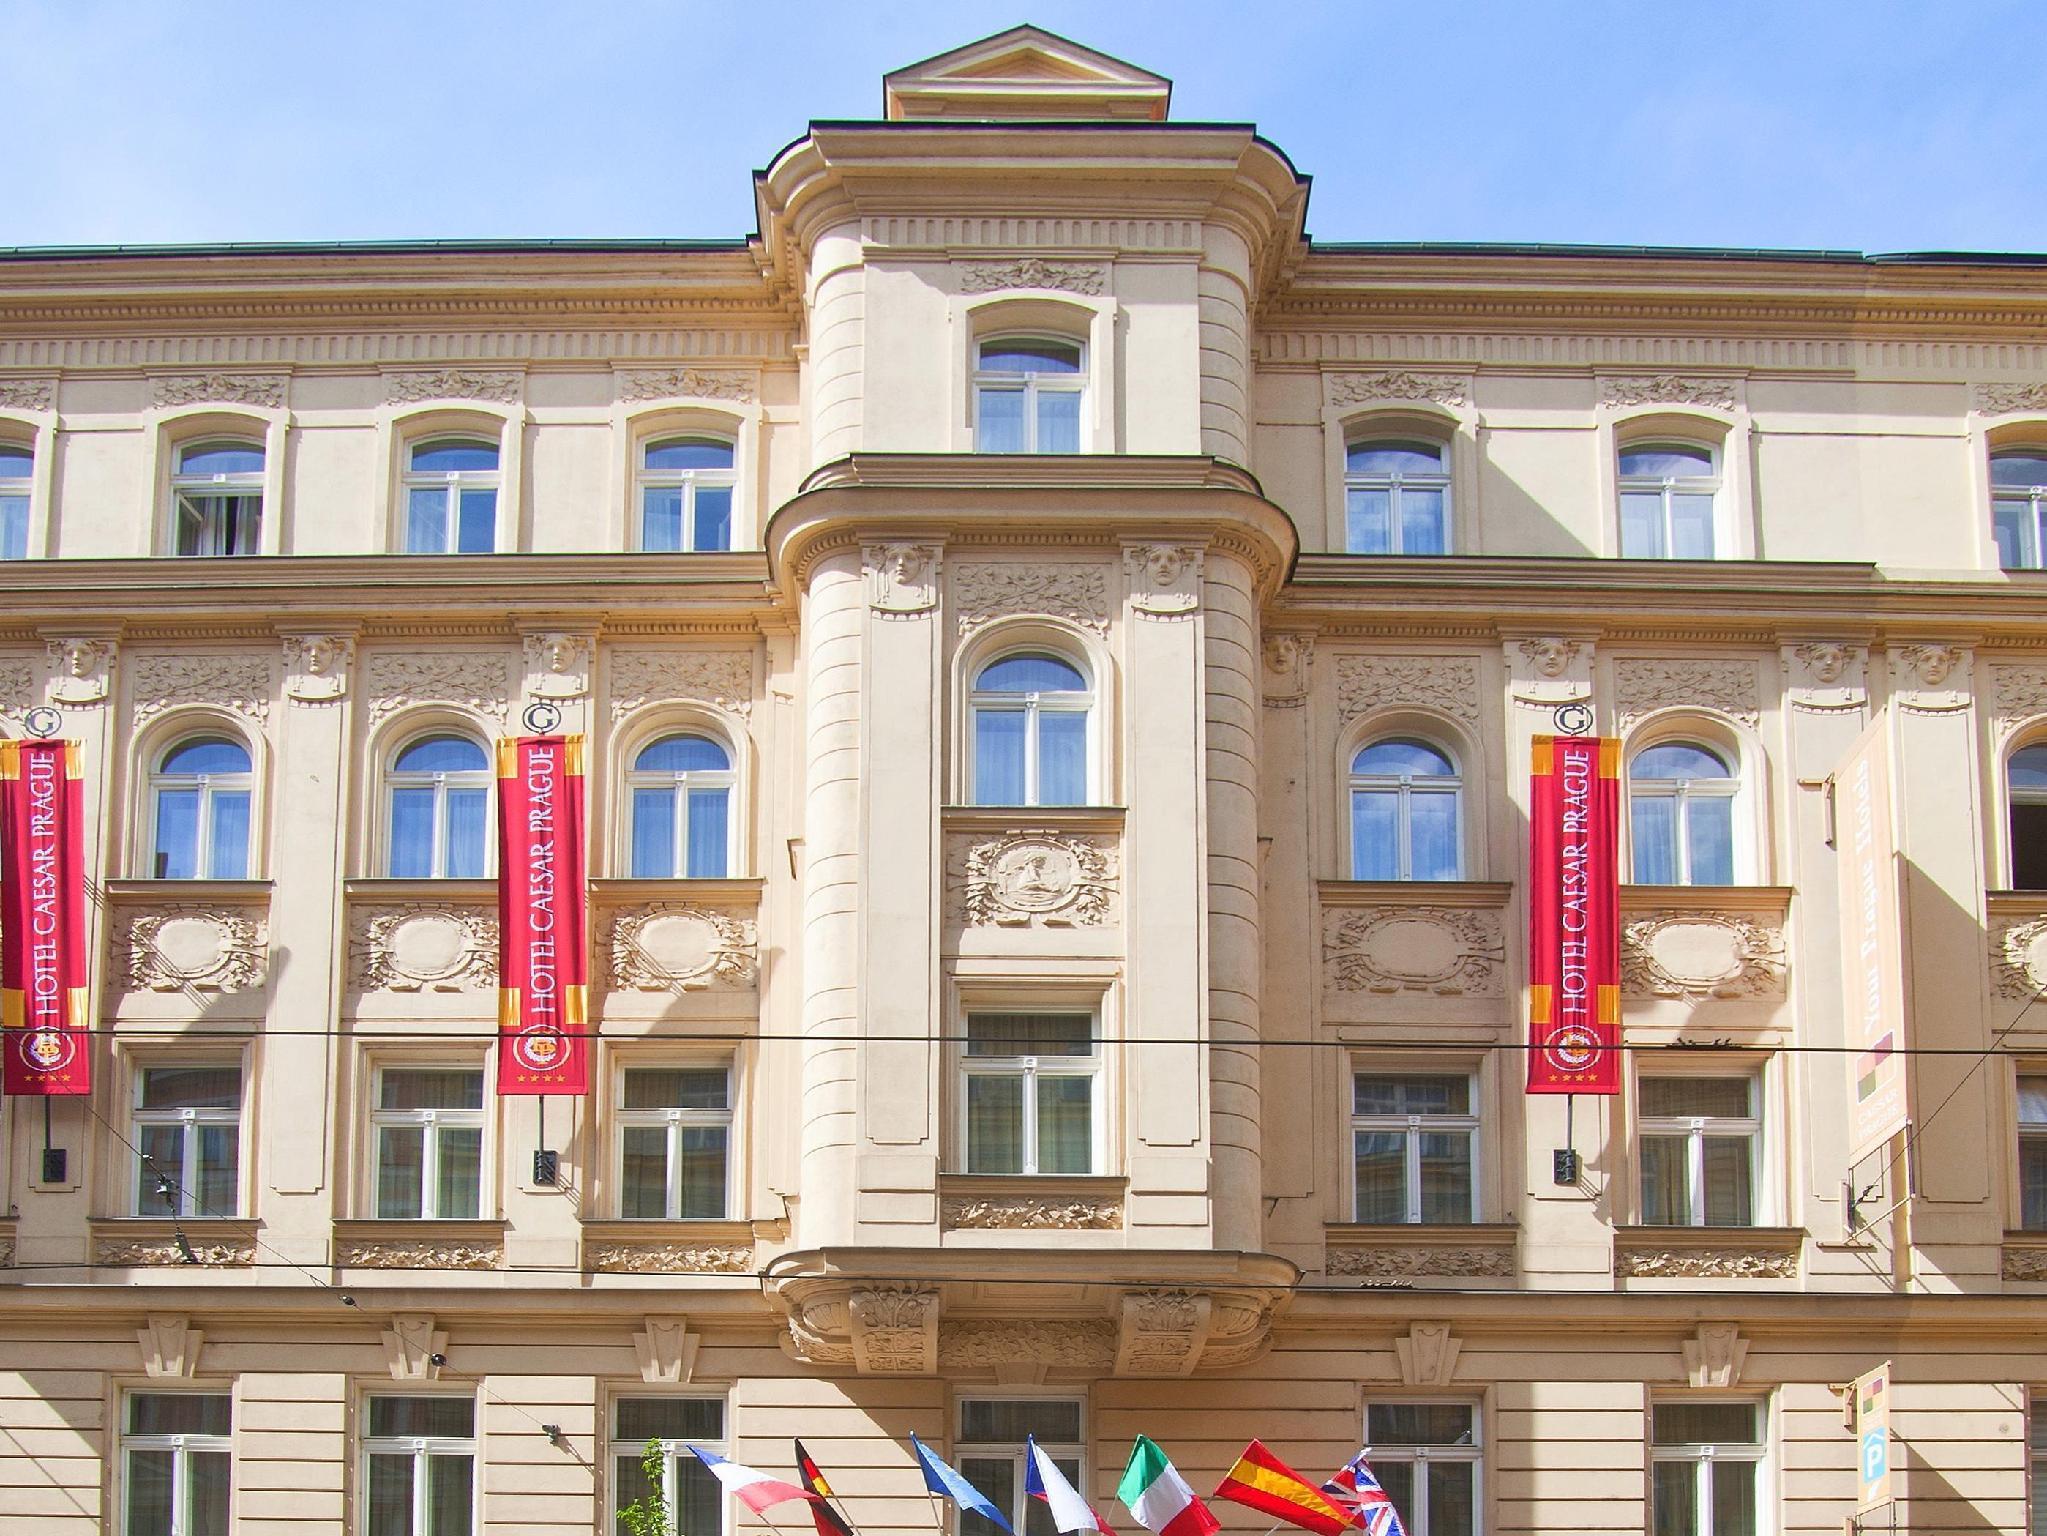 Hotels in prague czech republic book hotels and cheap for Europe hotel prague